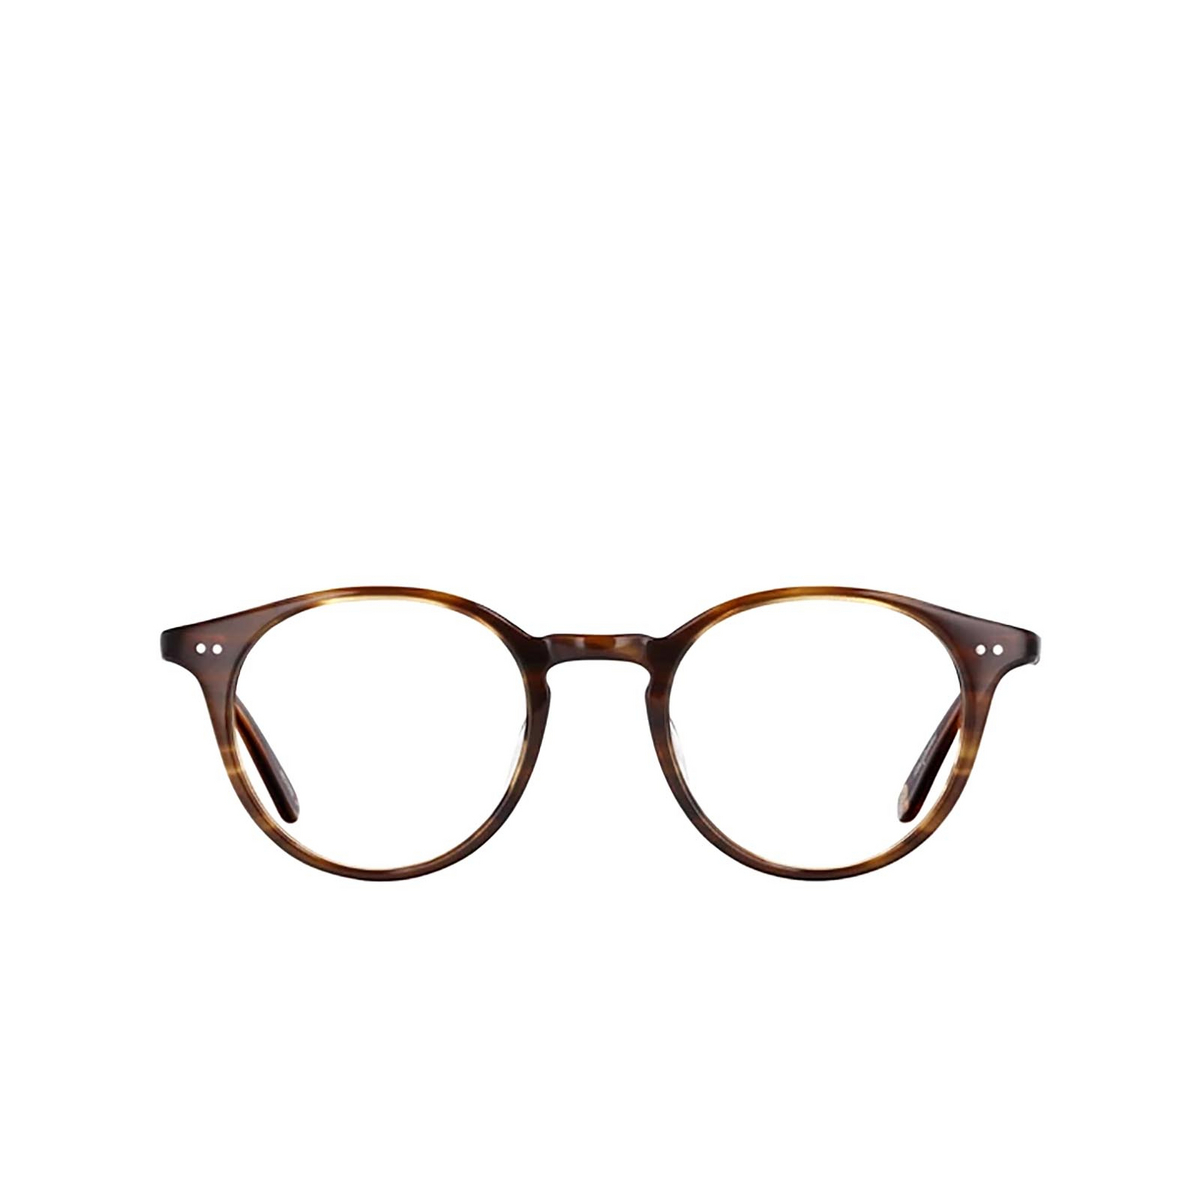 Garrett Leight® Round Eyeglasses: Clune color Brandy Tortoise Brt - front view.